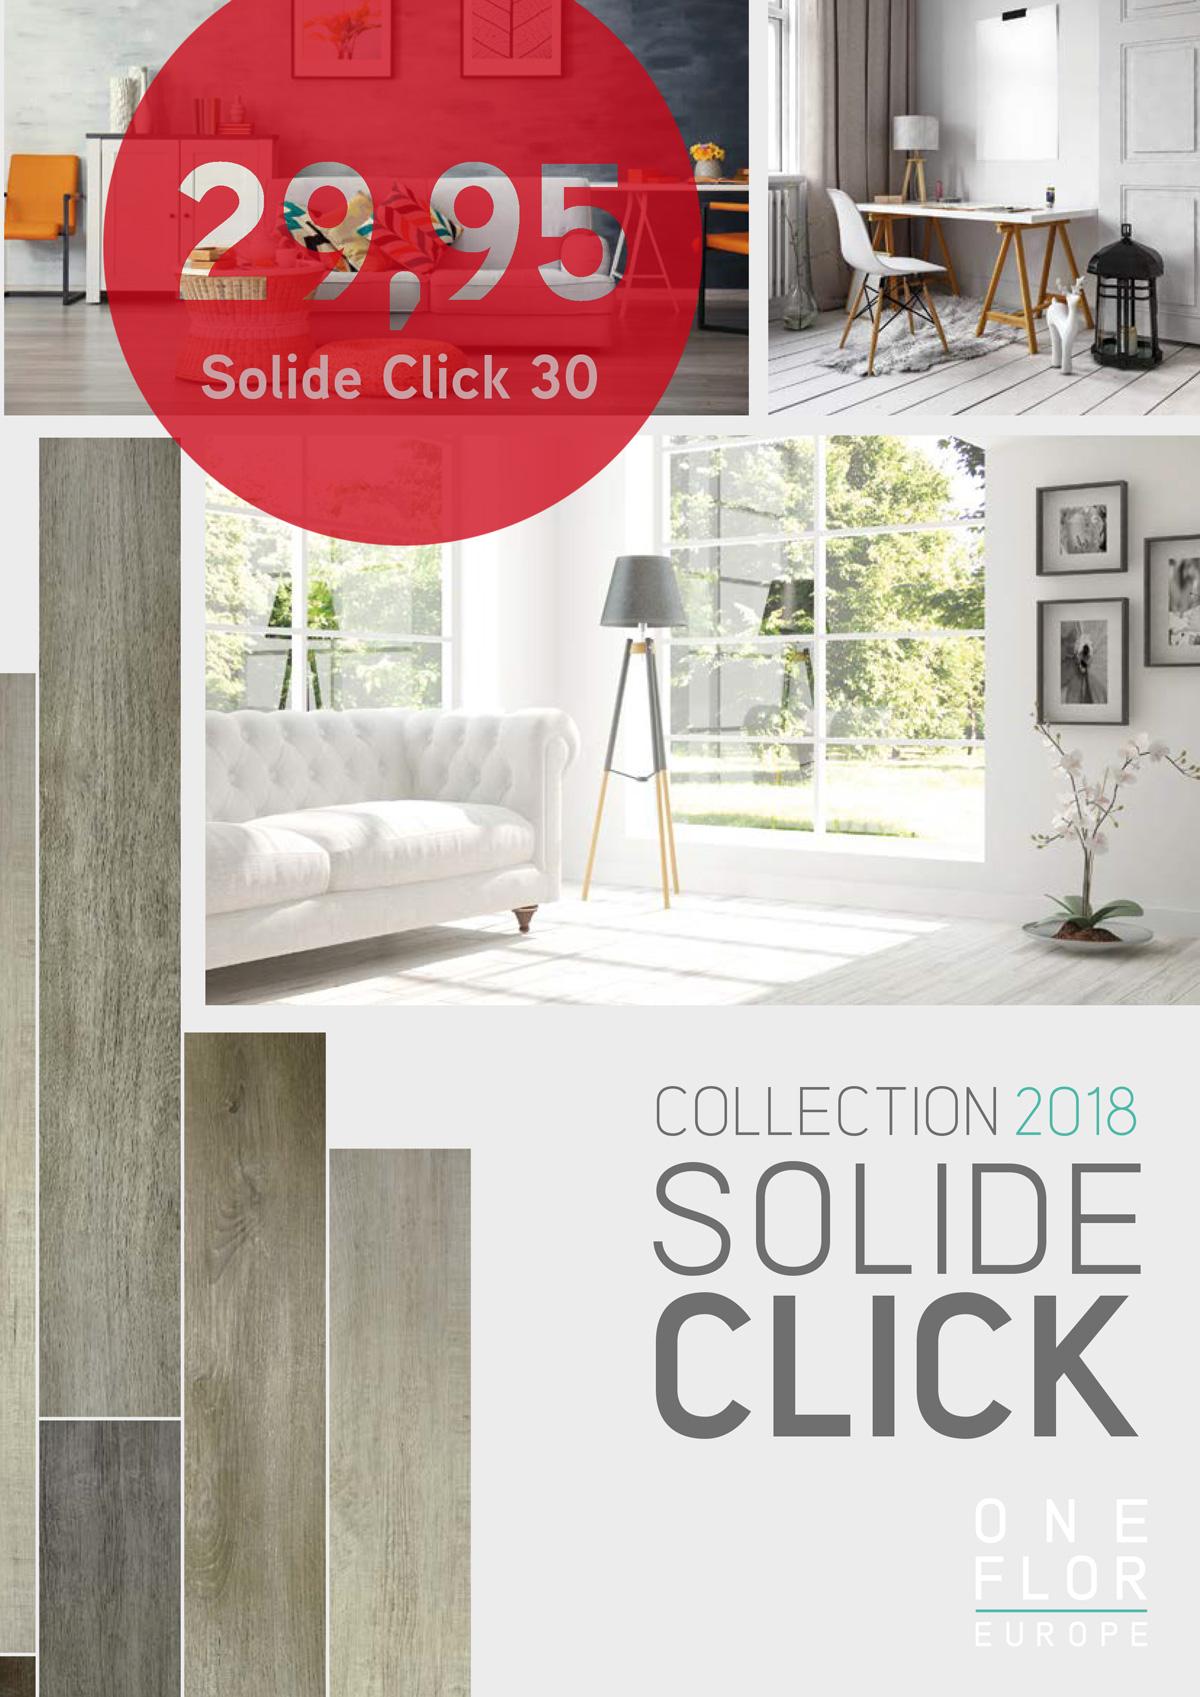 one_flor_solide_click30